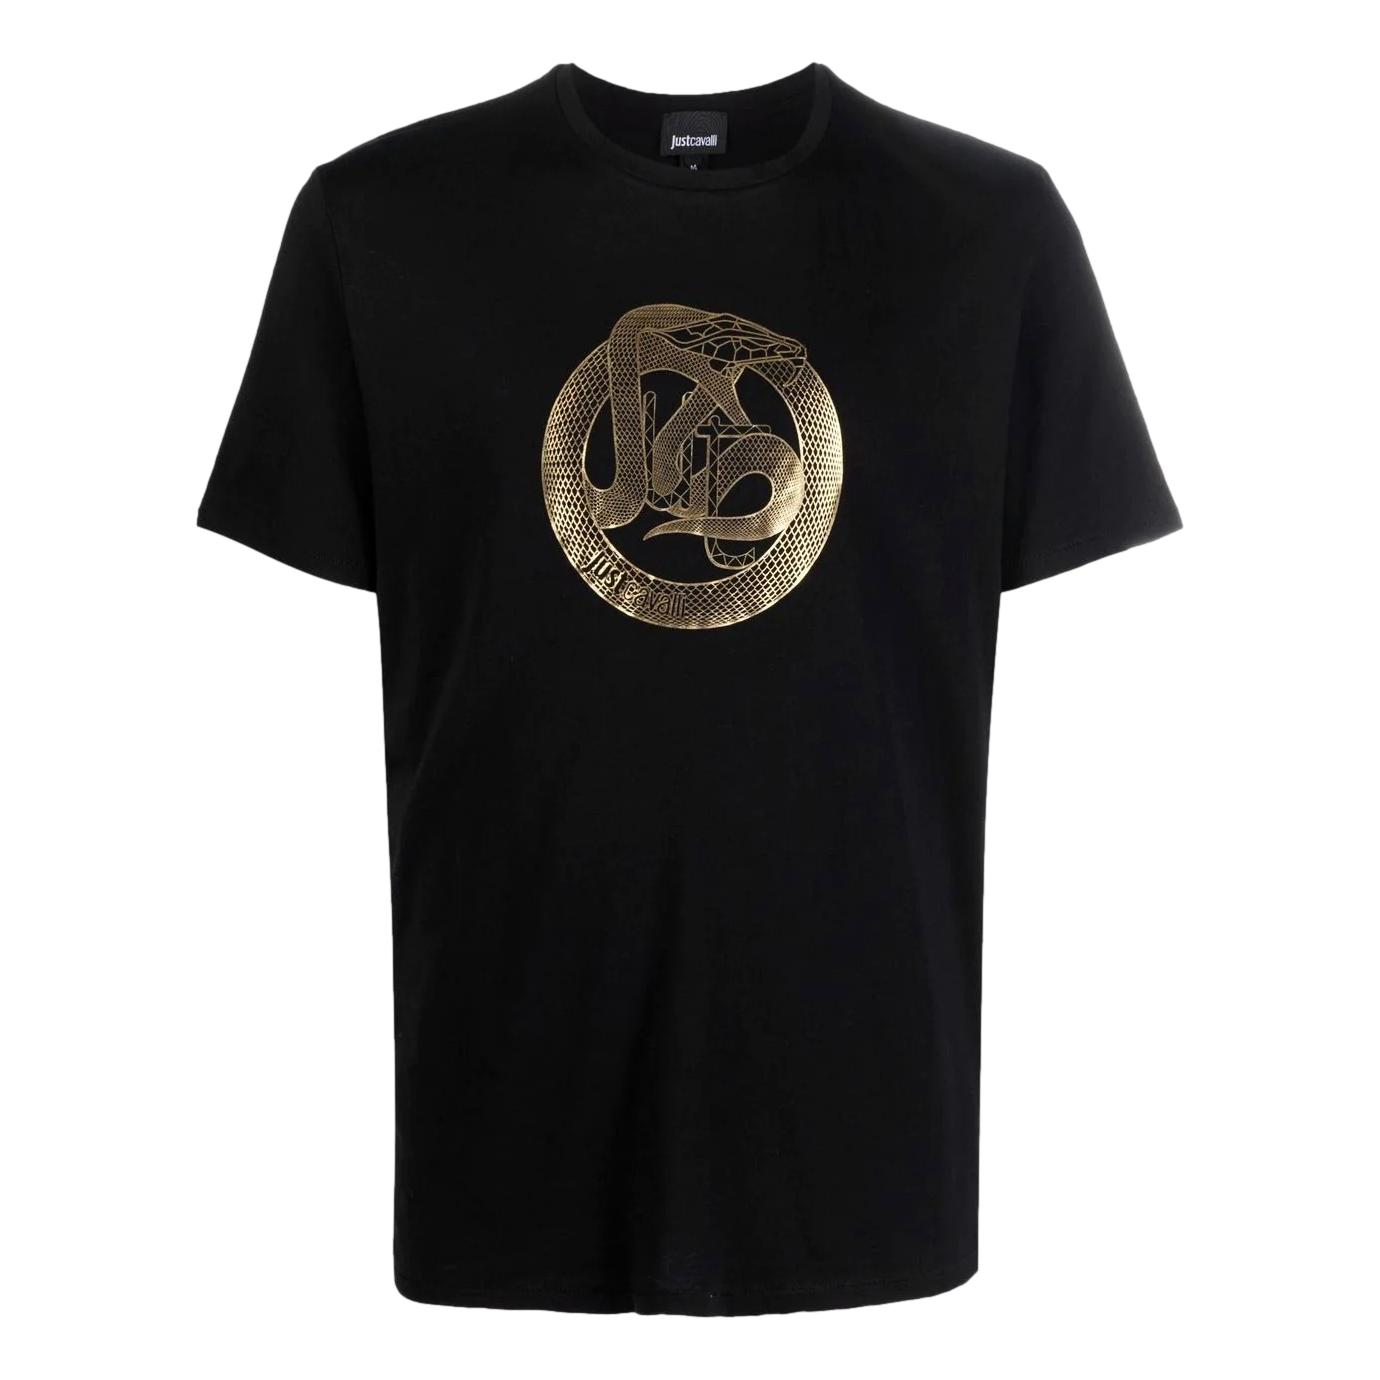 T-shirt con stampa logo oro serpente JUST CAVALLI | T-shirt | S03GC0638 N20663900